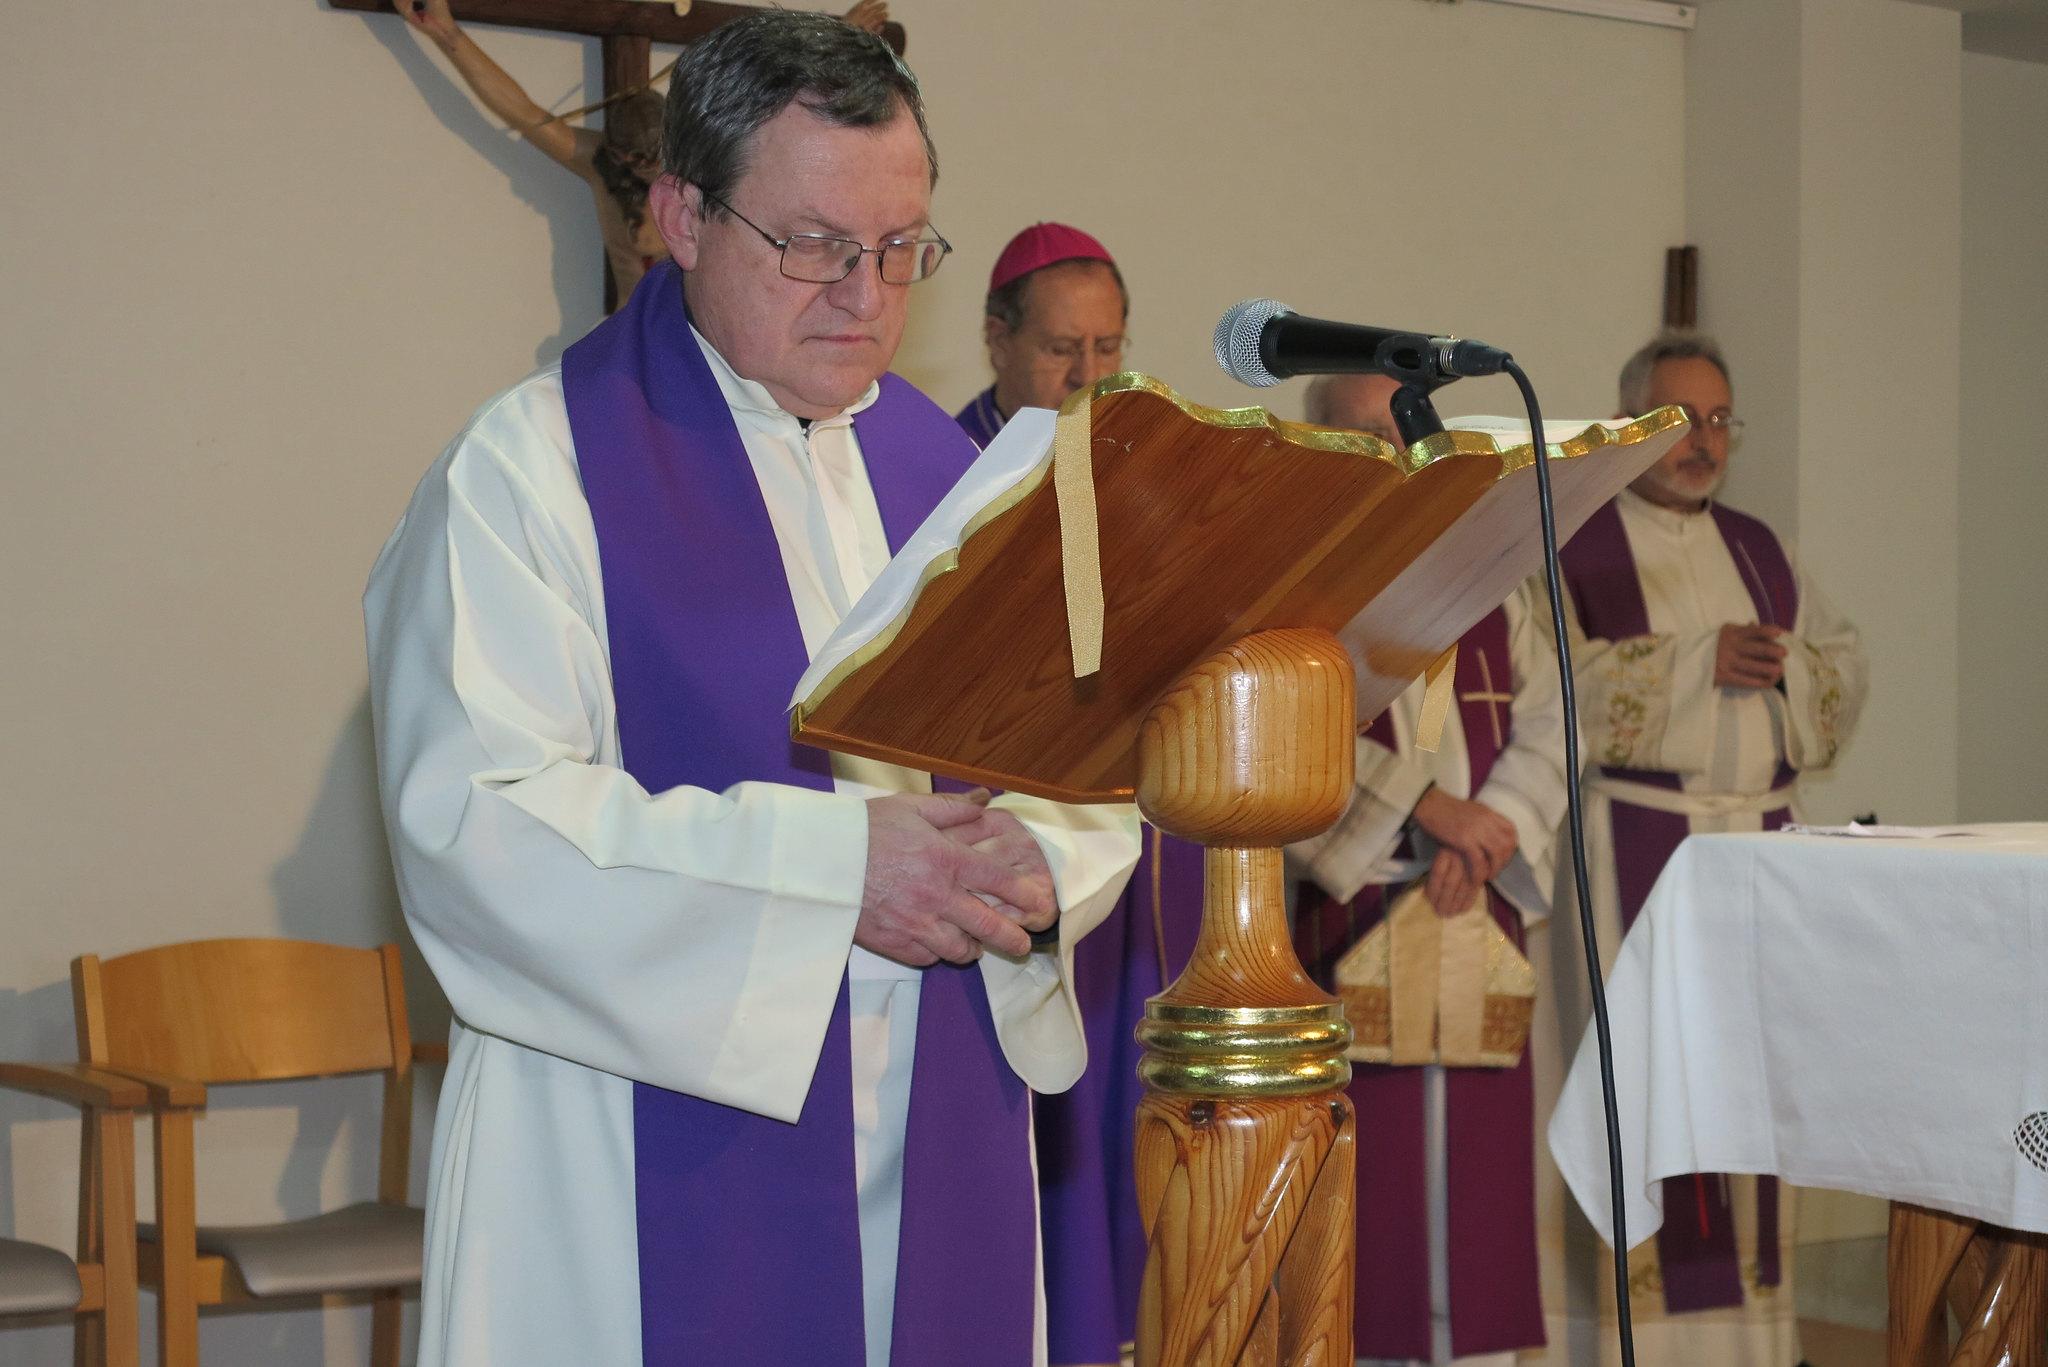 (2016-02-13) - Inauguración Virgen de Lourdes, La Molineta - Archivo La Molineta 2 (05)